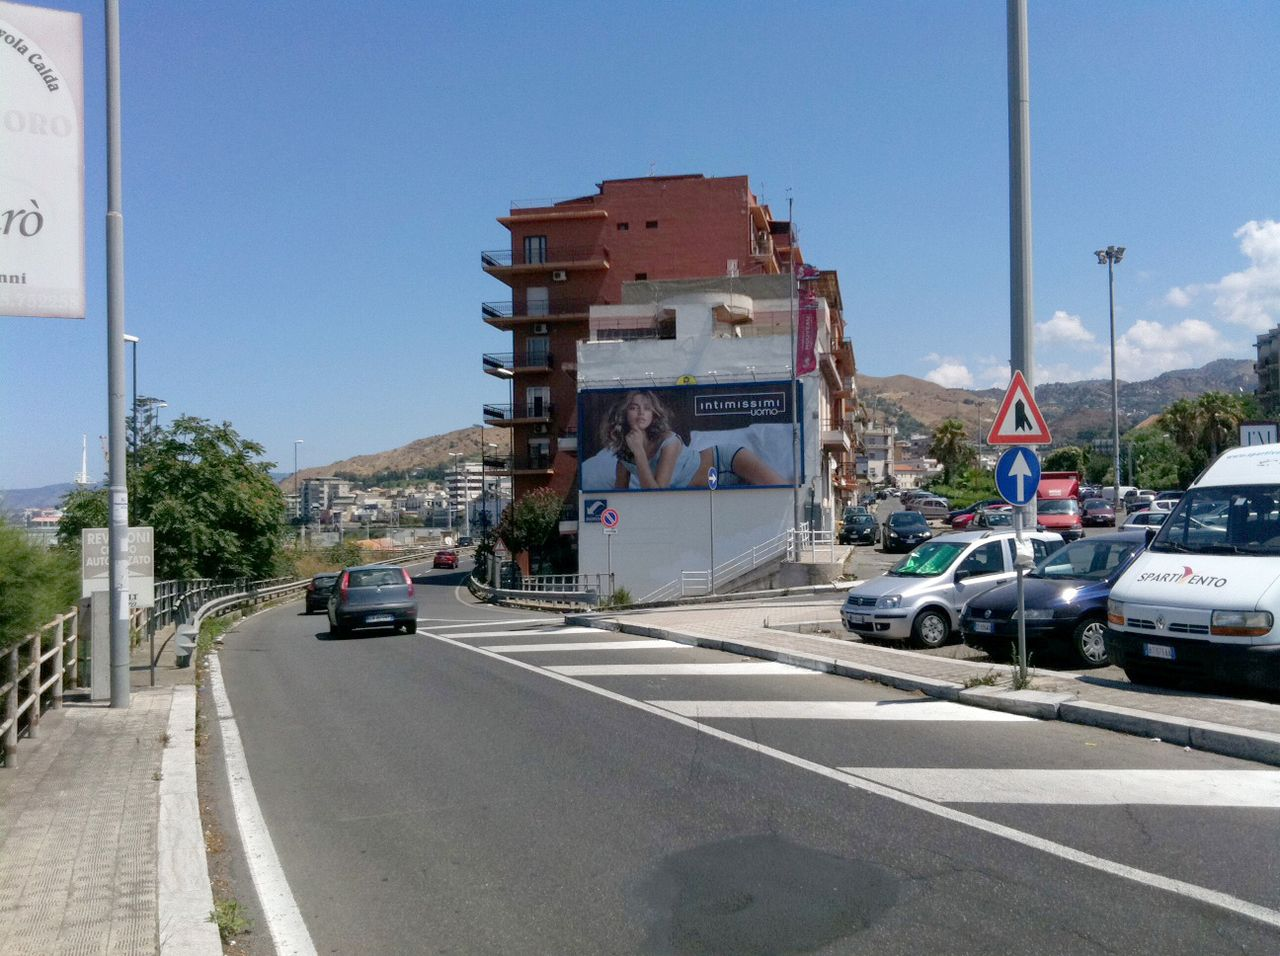 http://www.postermap.it/wp-content/uploads/2015/11/574-Reggio-Calabria-Via-Argine-Dx-Annunziata.jpg